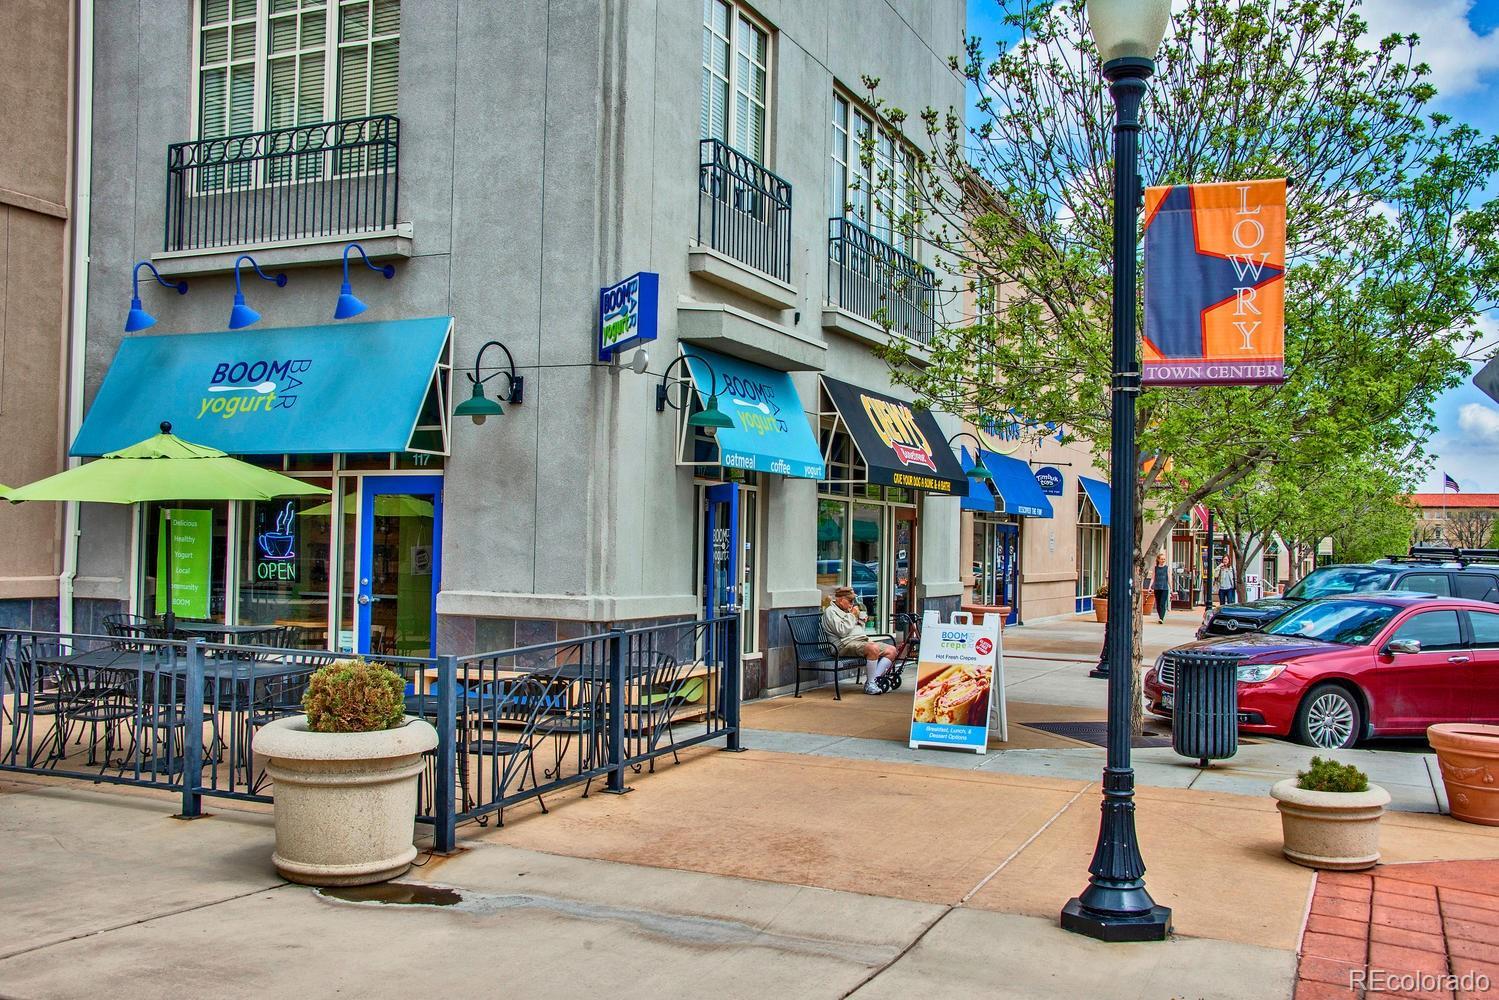 MLS# 7031460 - 13 - 8555 Fairmount Drive #H107, Denver, CO 80247